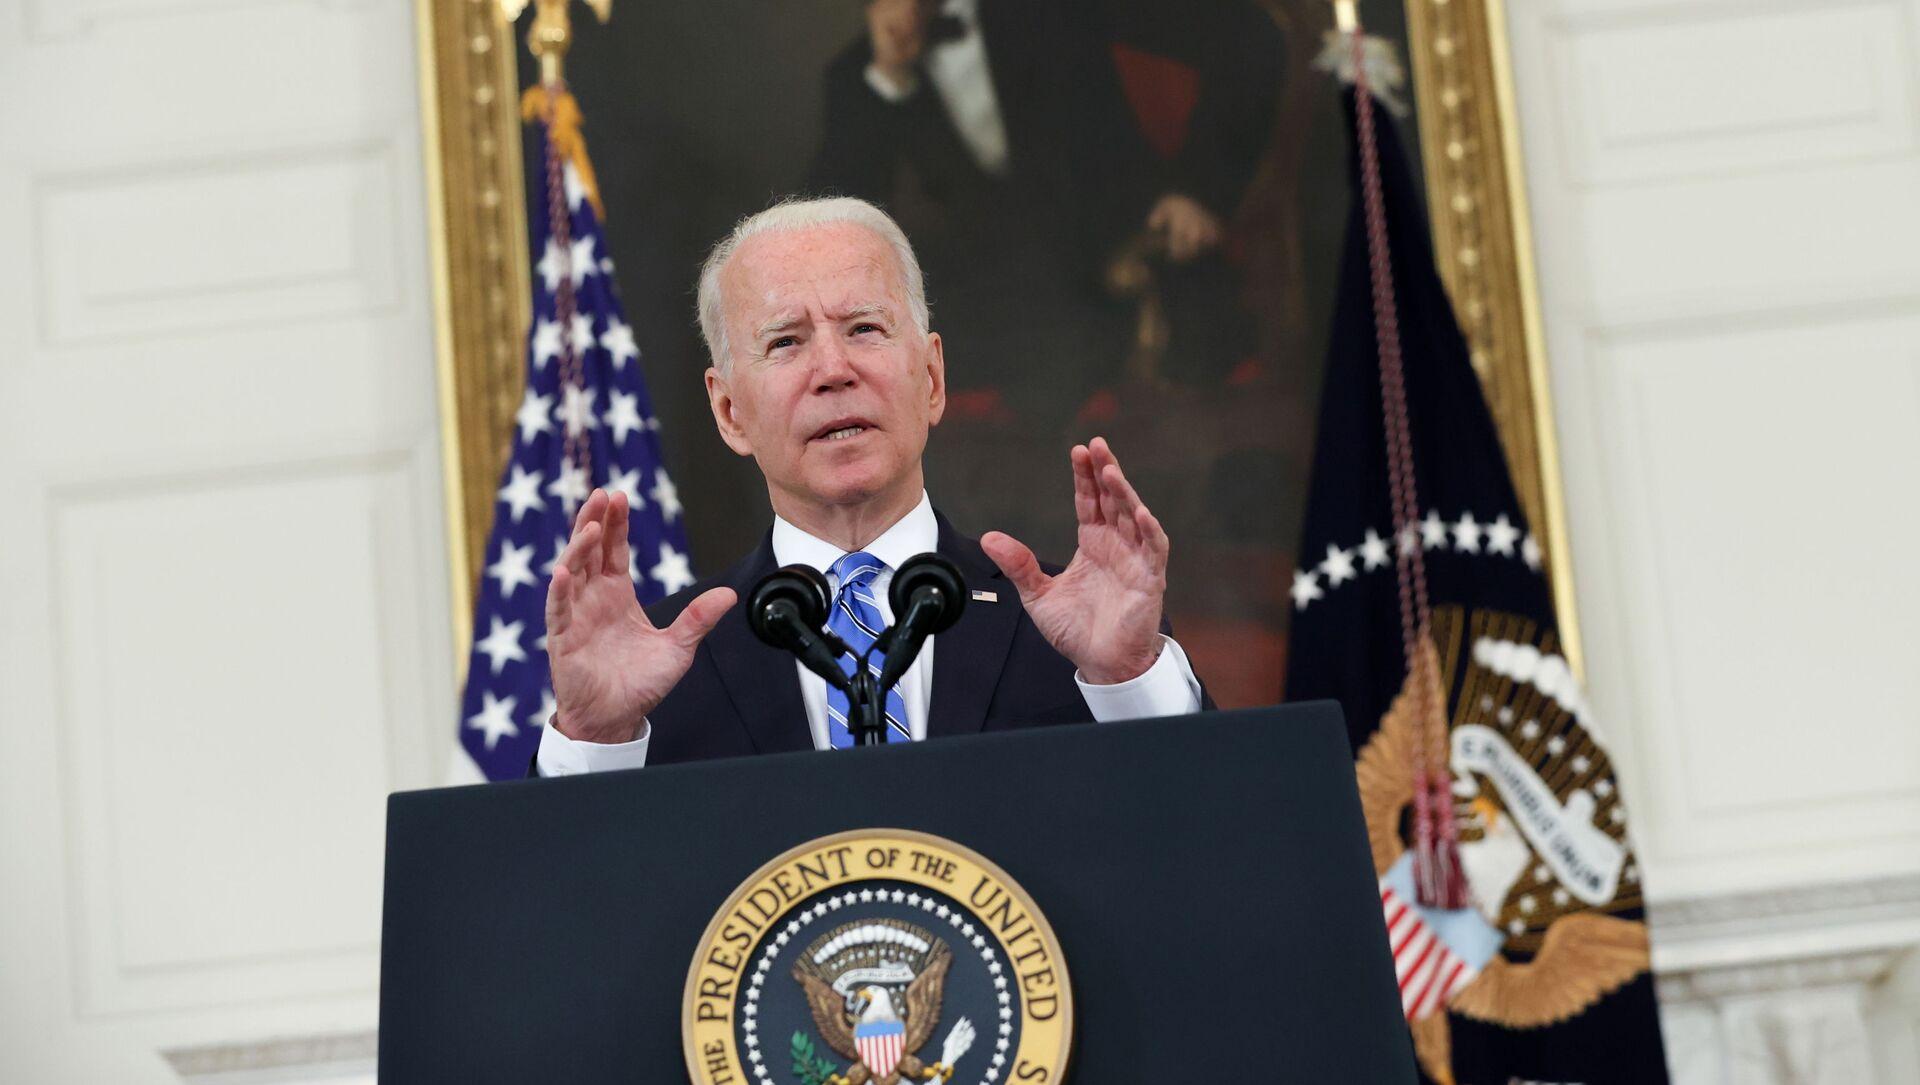 U.S. President Biden delivers remarks on the economy at the White House in Washington - Sputnik International, 1920, 28.07.2021